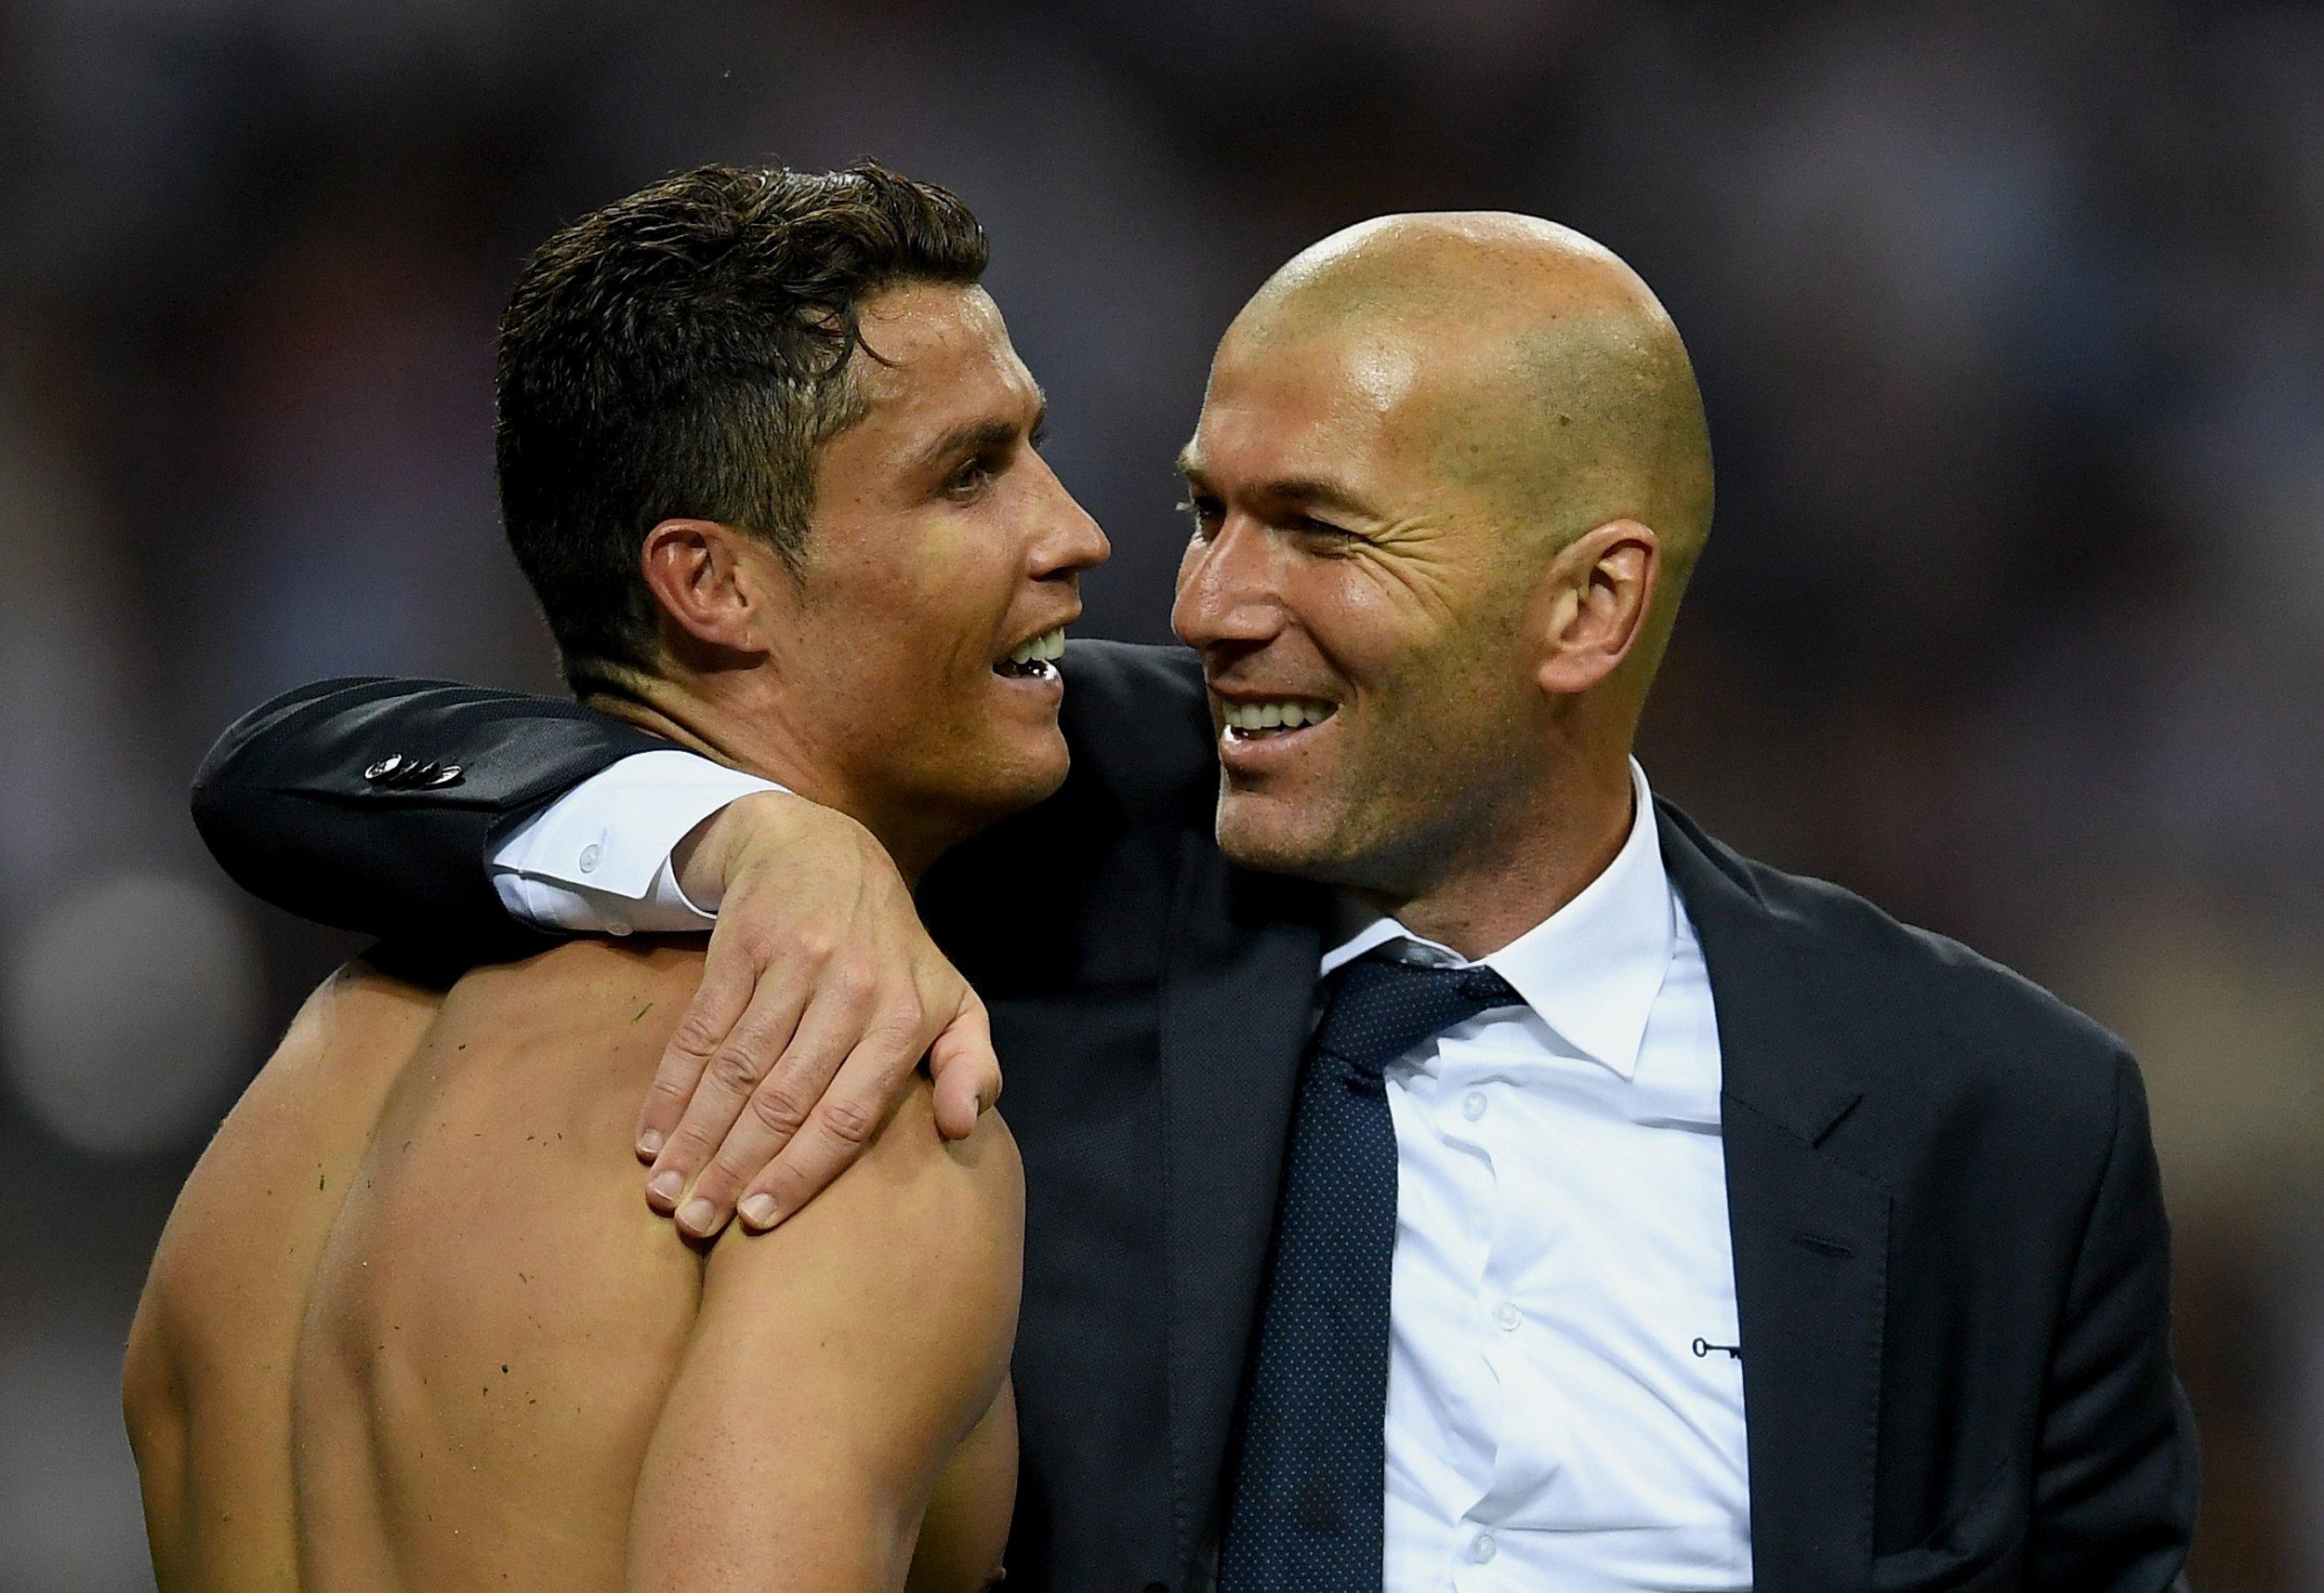 Real Madrid's Zinedine Zidane, right, with Cristiano Ronaldo.